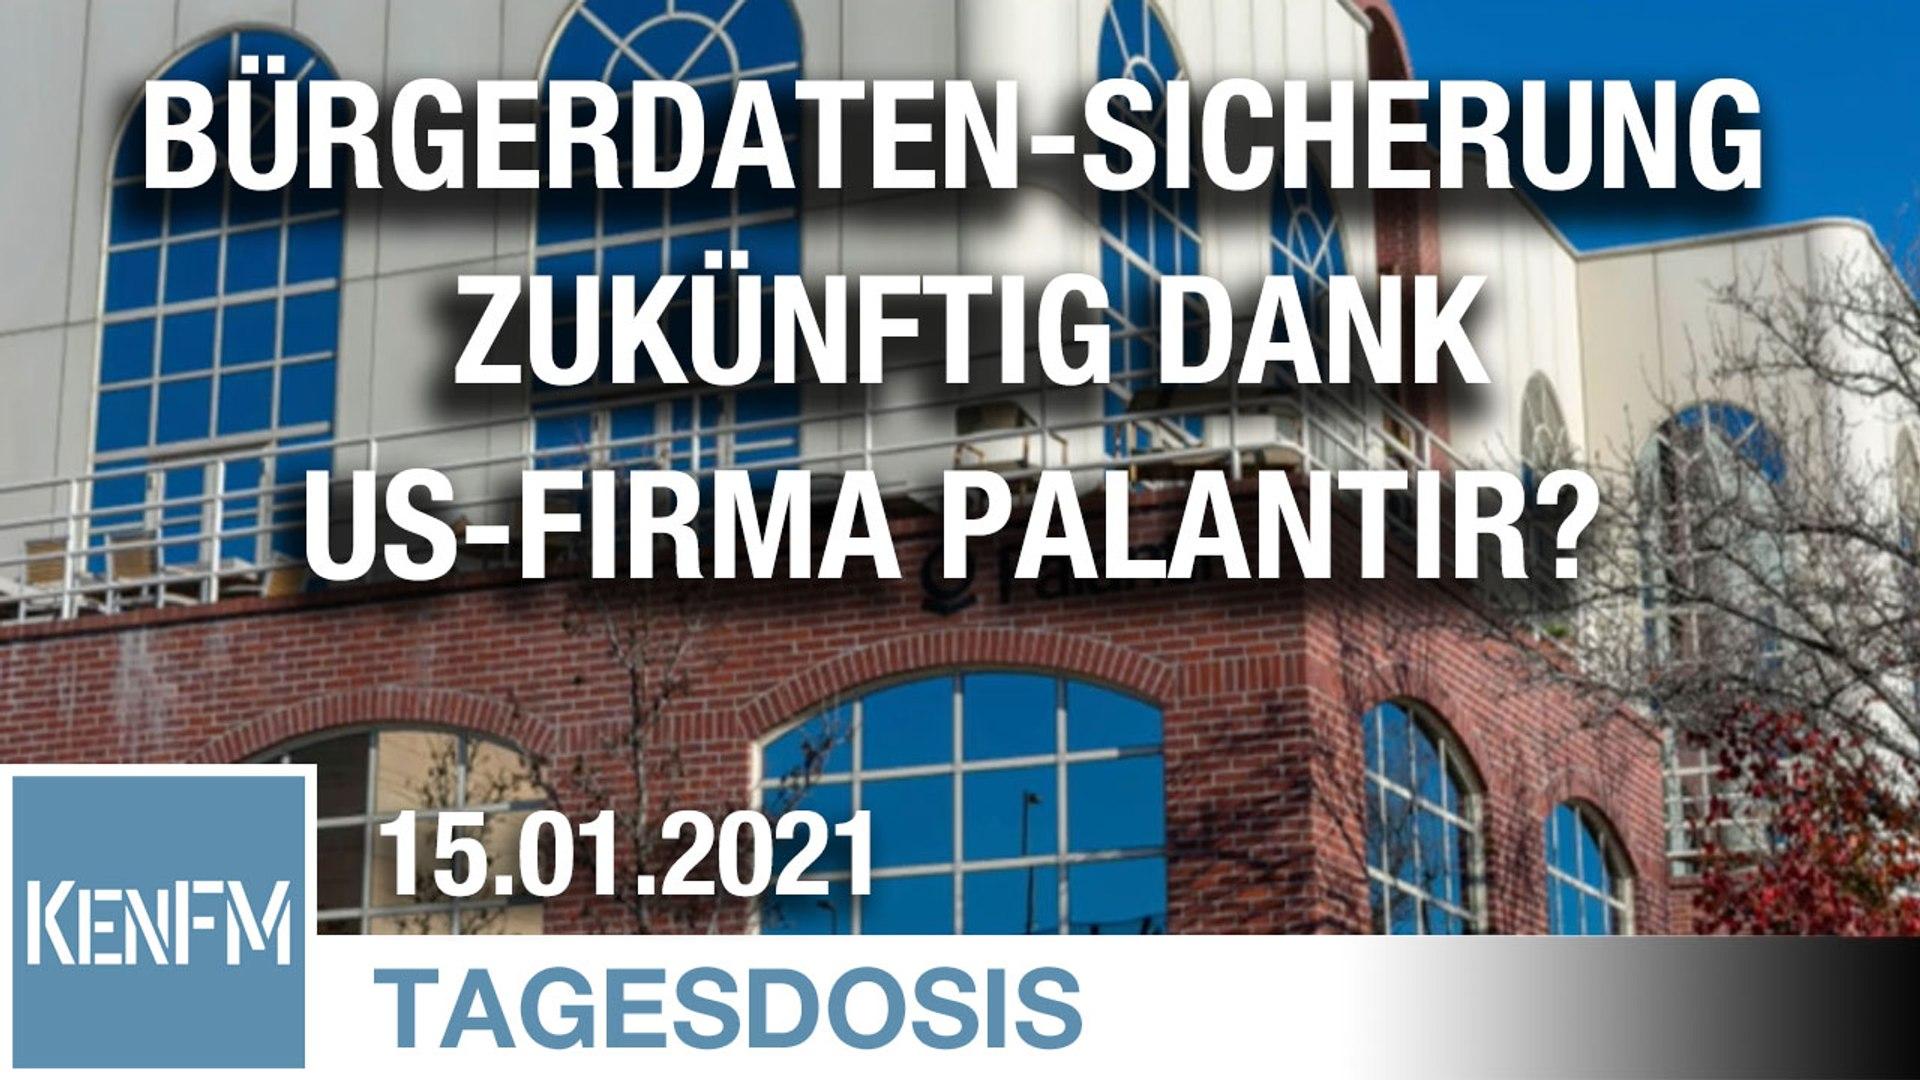 Deutsche Bürgerdaten-Sicherung zukünftig dank US-Firma Palantir?